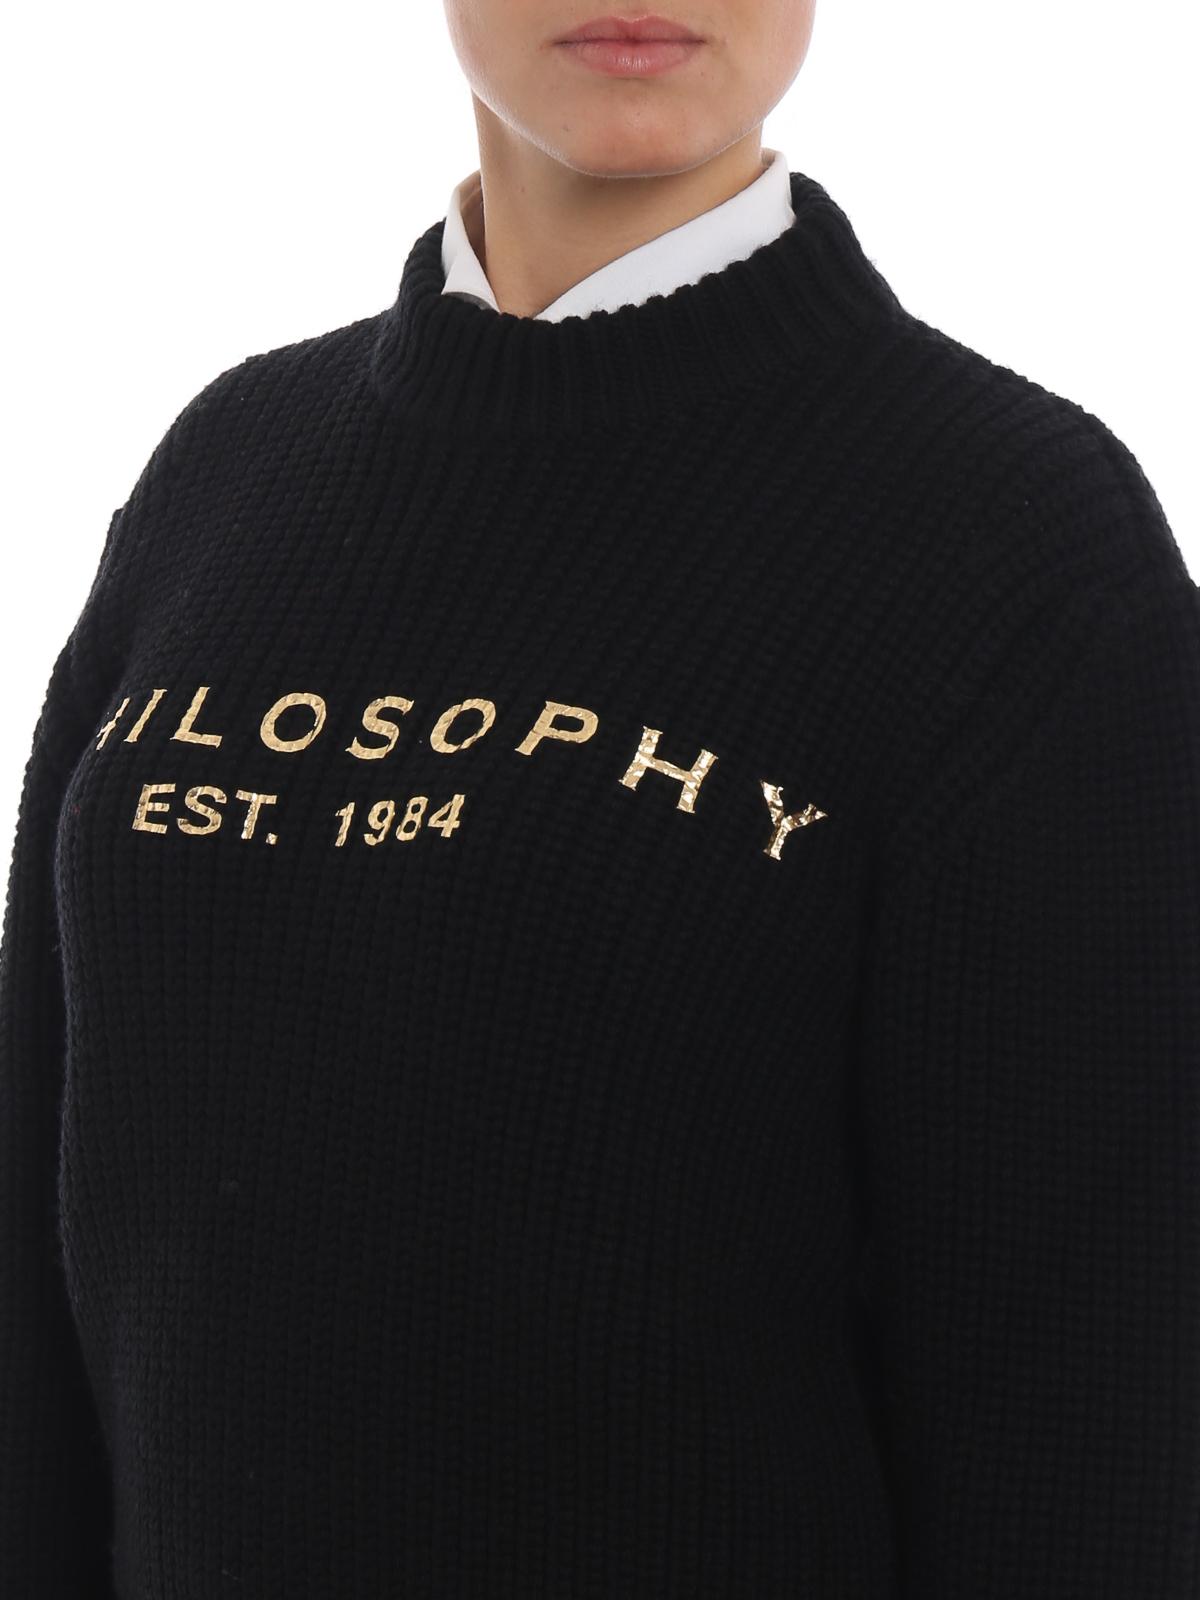 Gold-tone logo print black wool sweater PHILOSOPHY di LORENZO SERAFINI | 1 | 09145707A2555